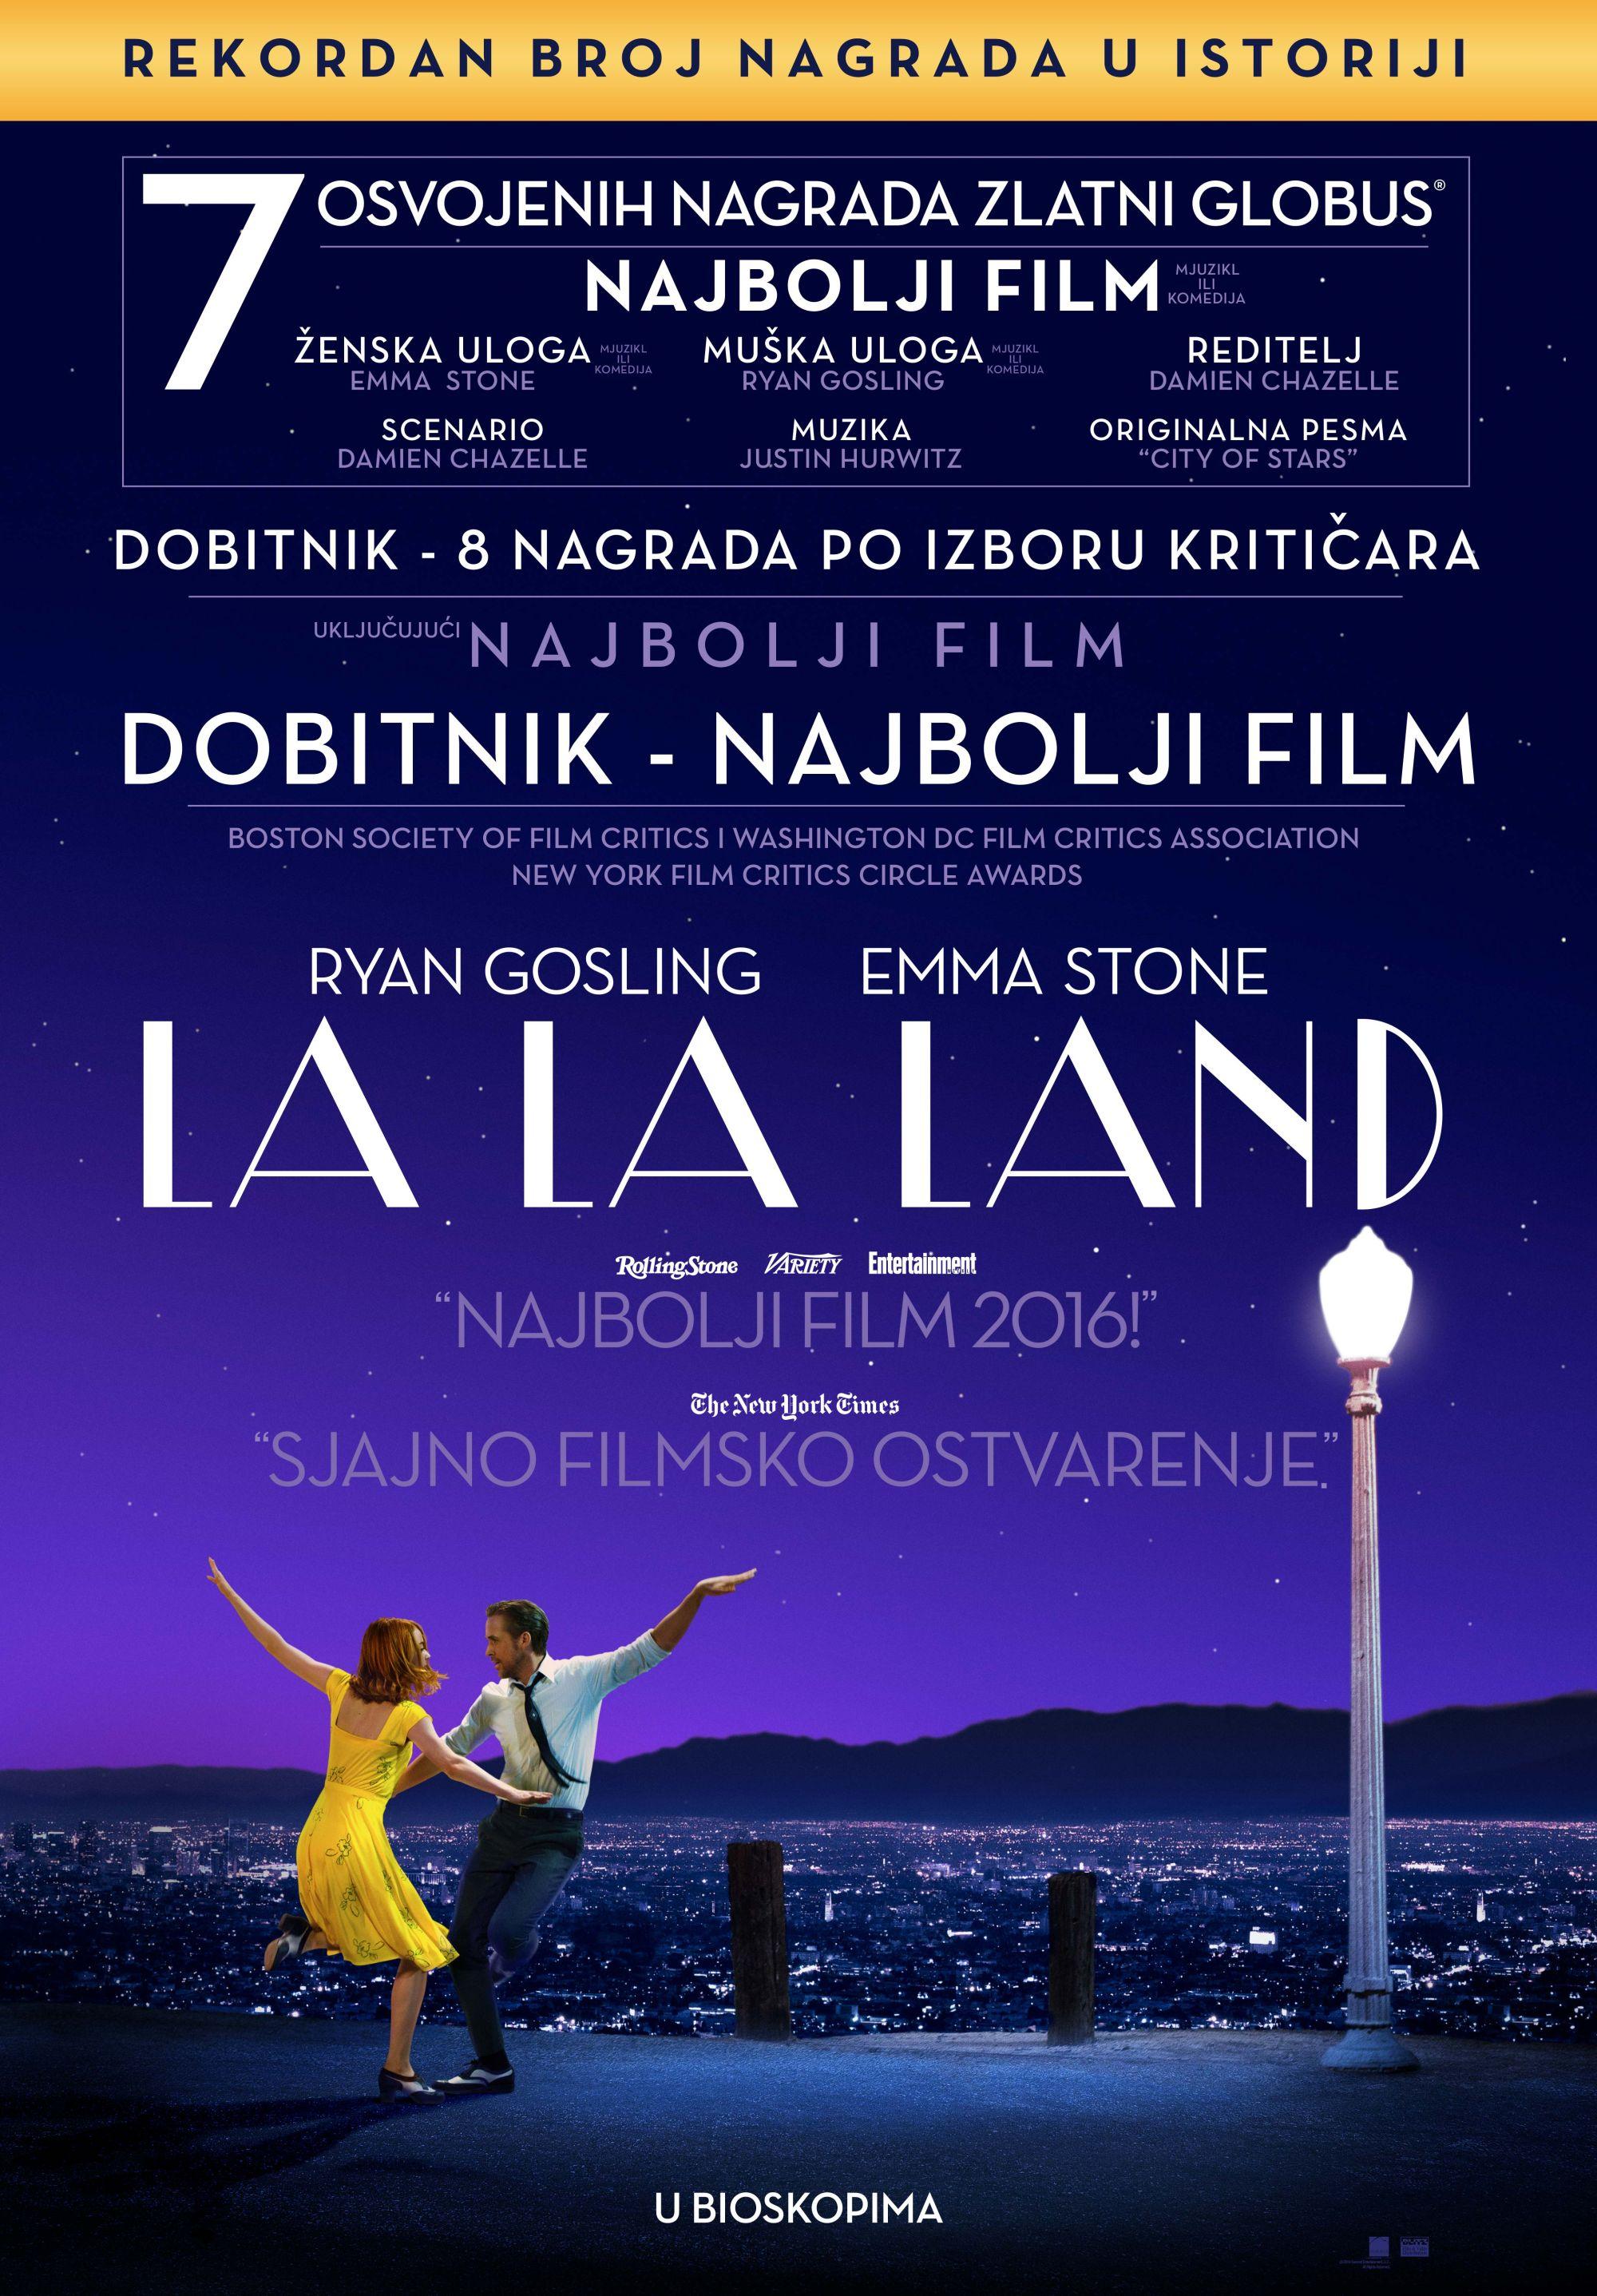 La la land (video)